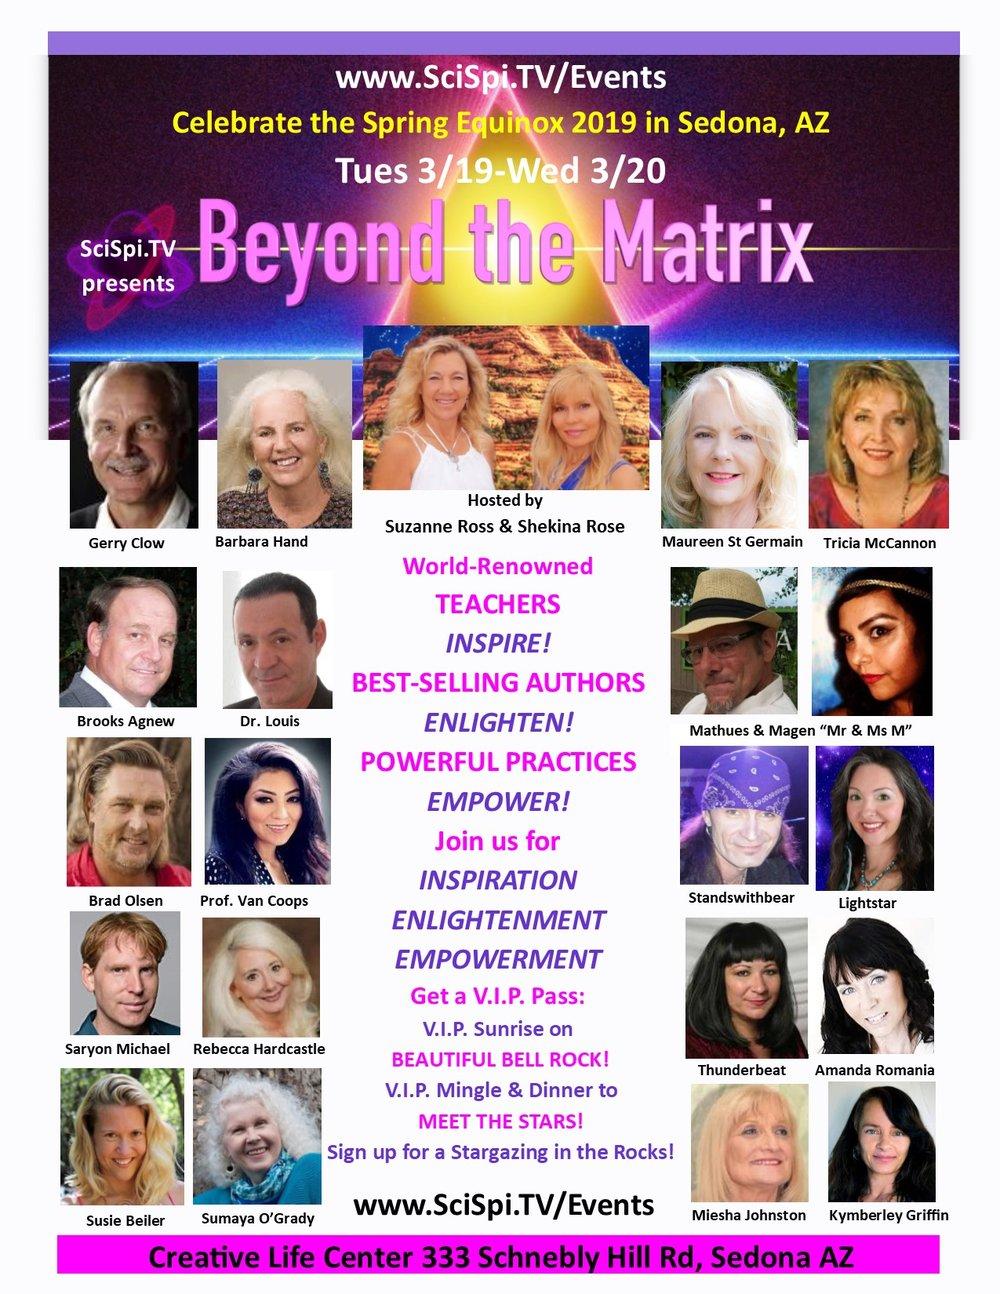 Beyond-the-Matrix-Mainstream.jpg